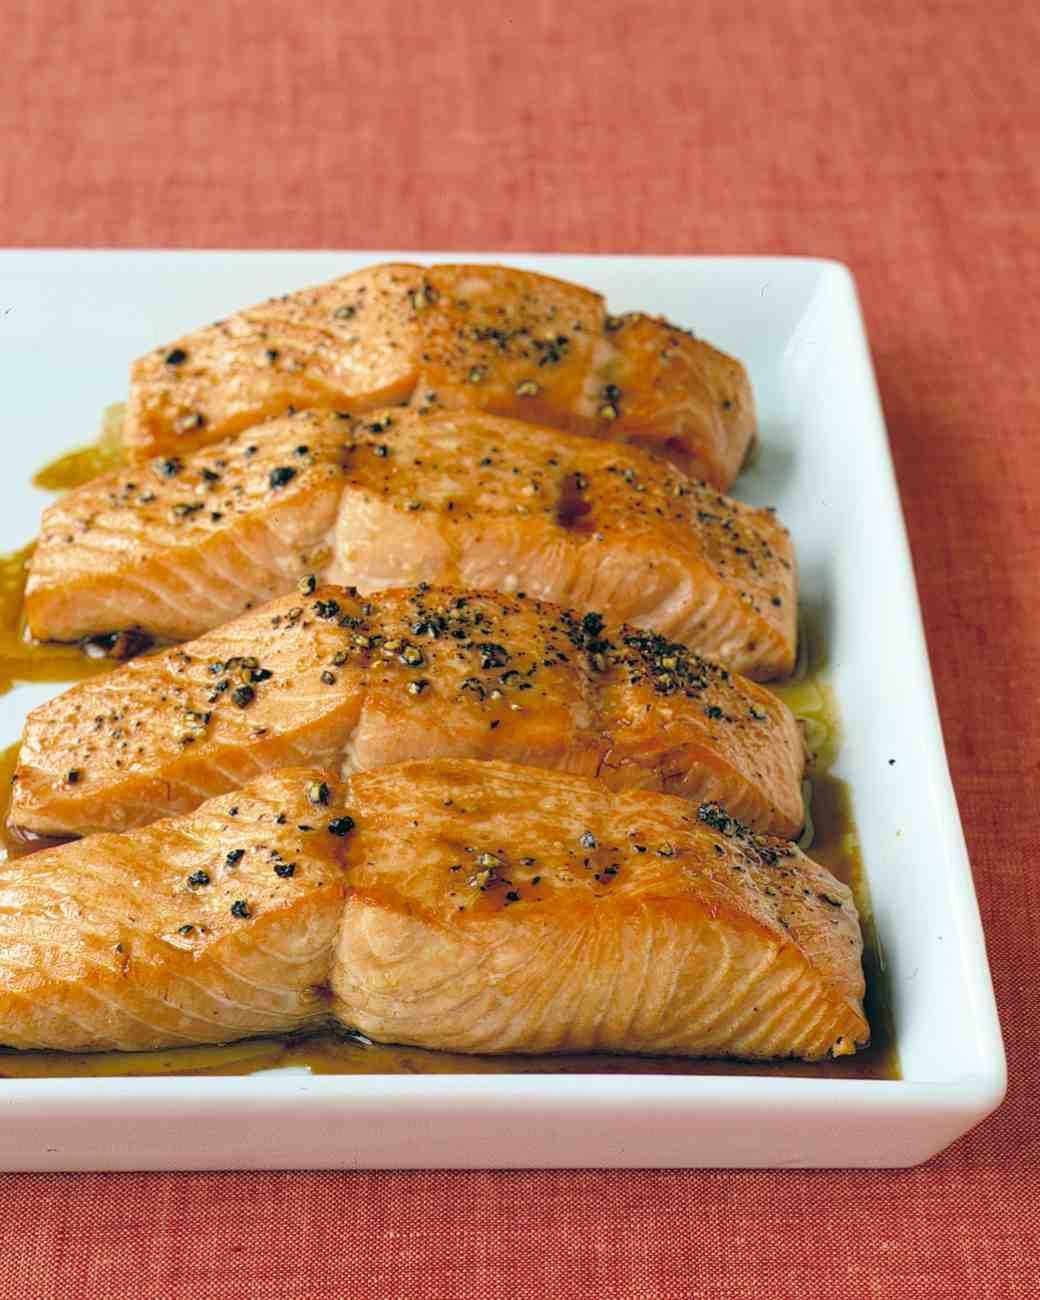 Soy-Glazed Salmon Recipe   Martha Stewart   Salmon recipes, Salmon glaze  recipes, Shellfish recipes